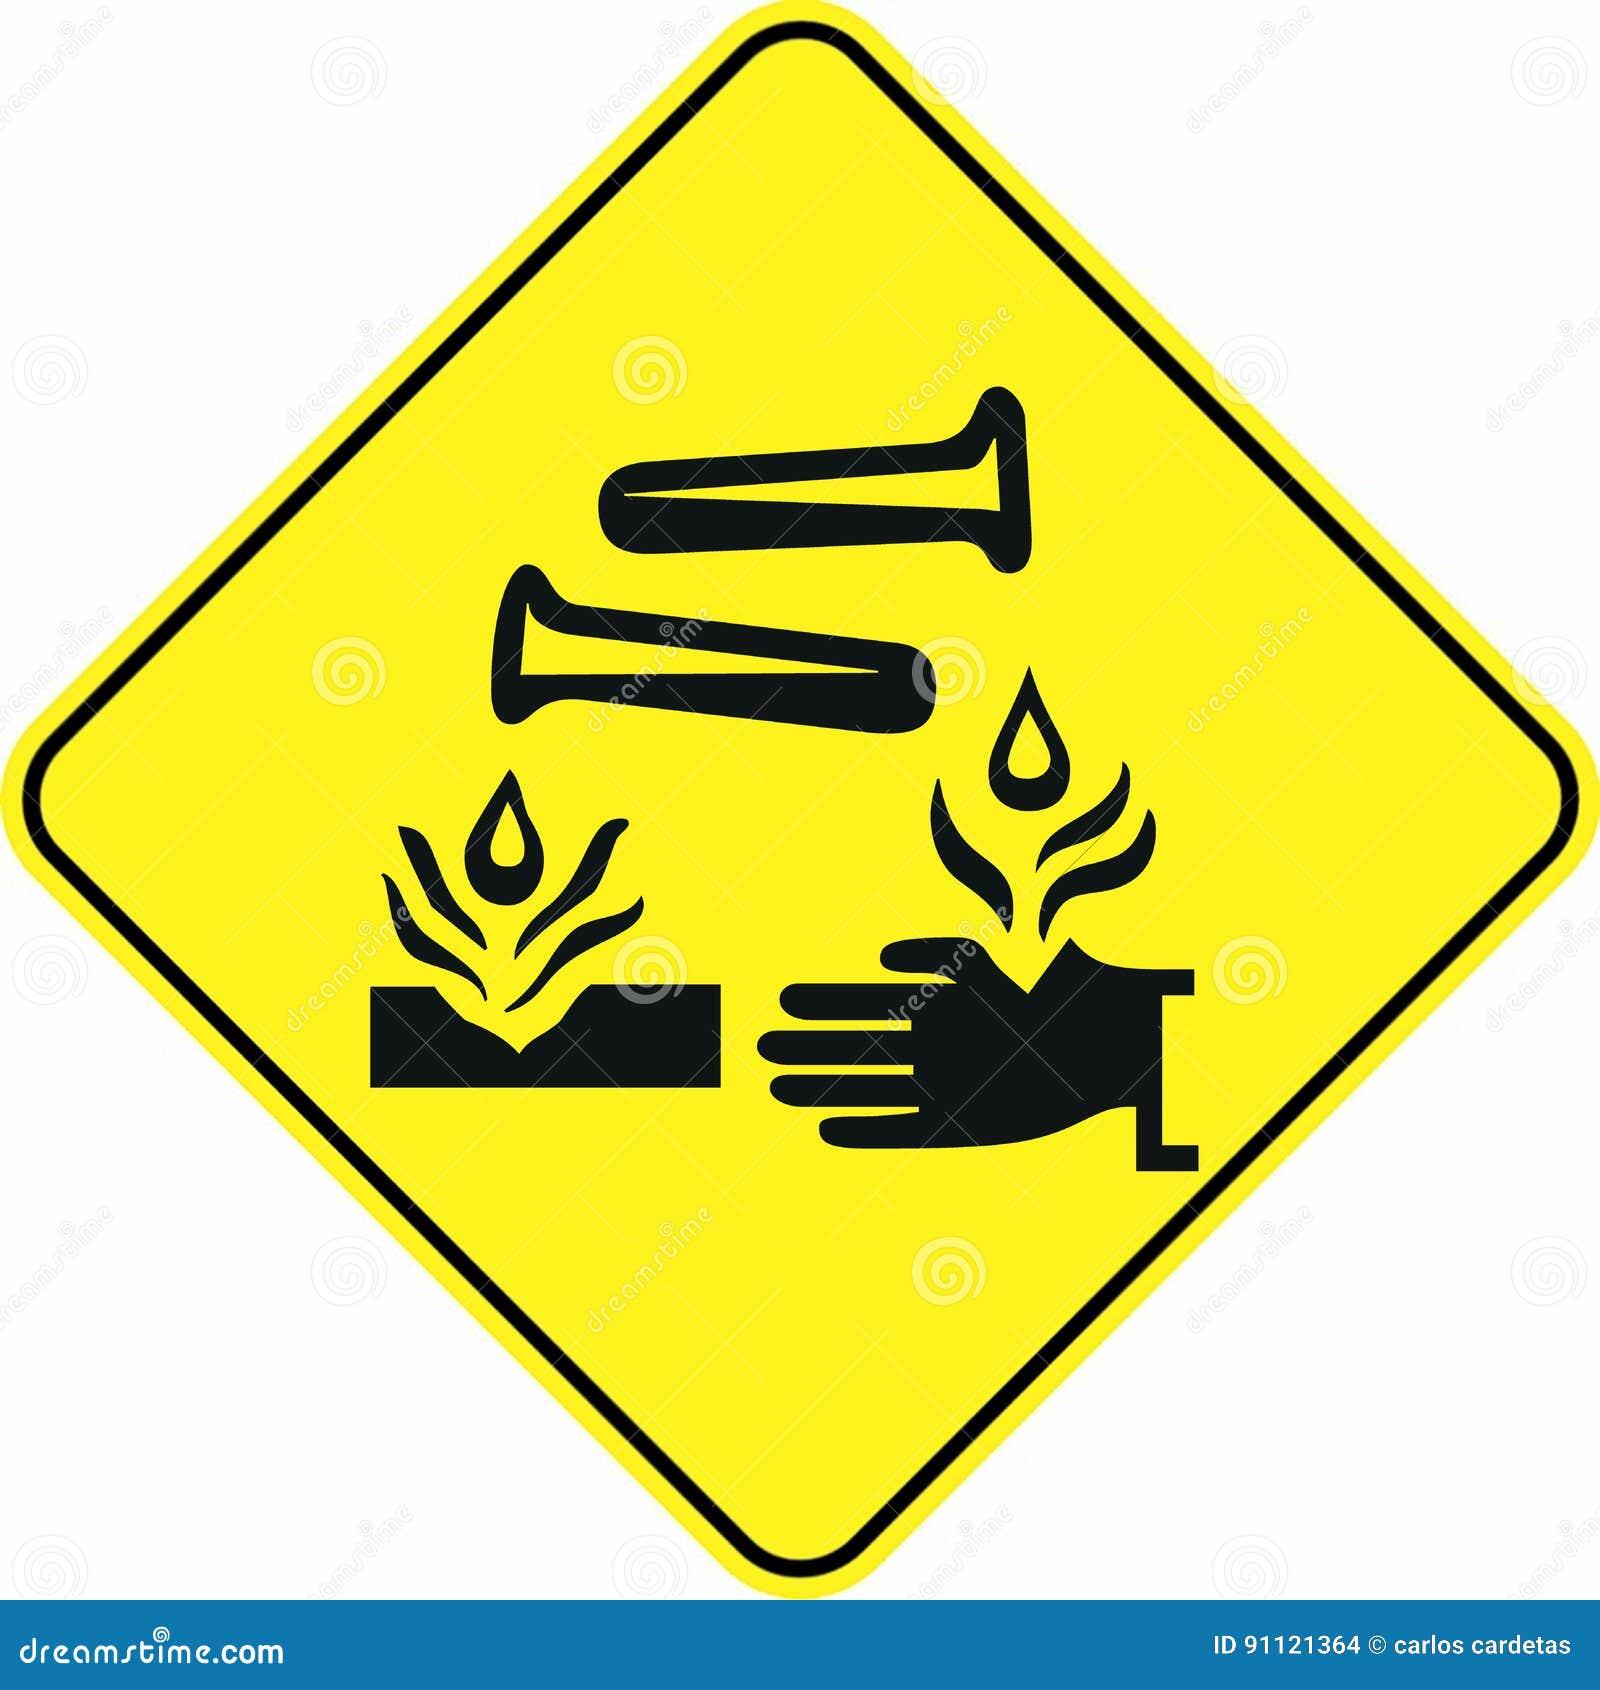 Attention alert corrosive substance symbol sign stock illustration attention alert corrosive substance symbol sign biocorpaavc Gallery